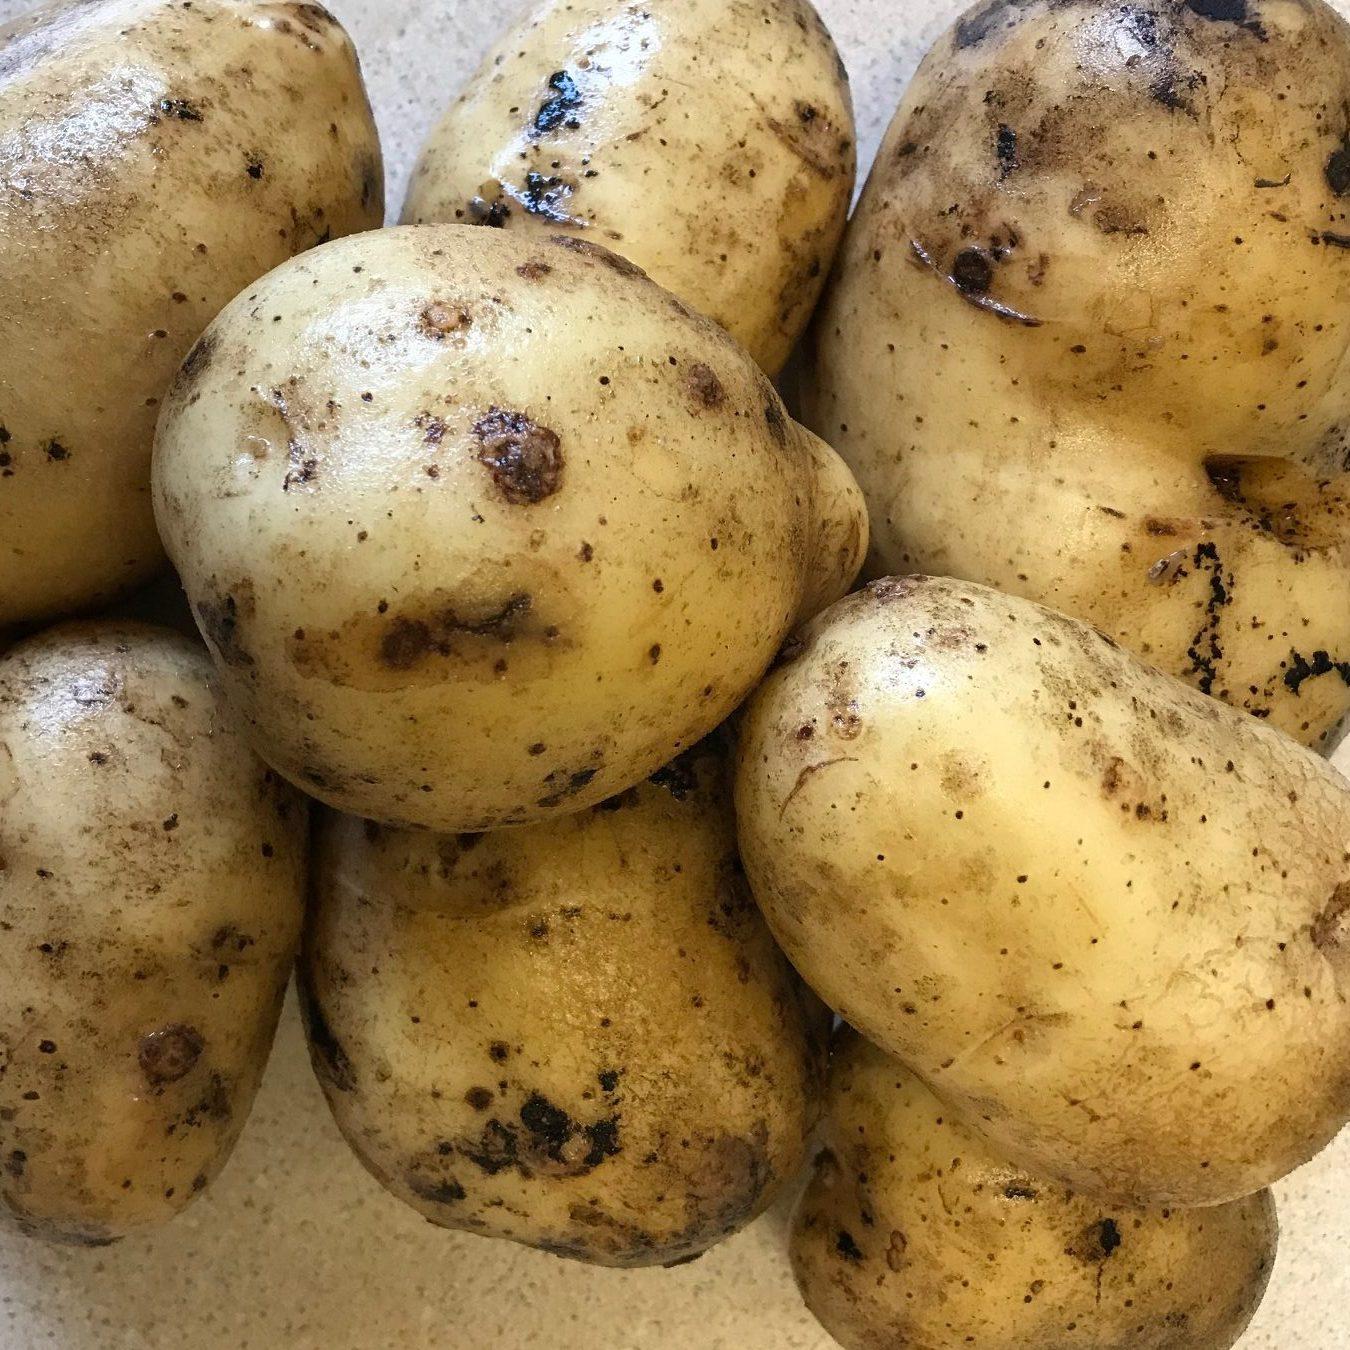 Speyfruit online fruit and veg chipping potatoes